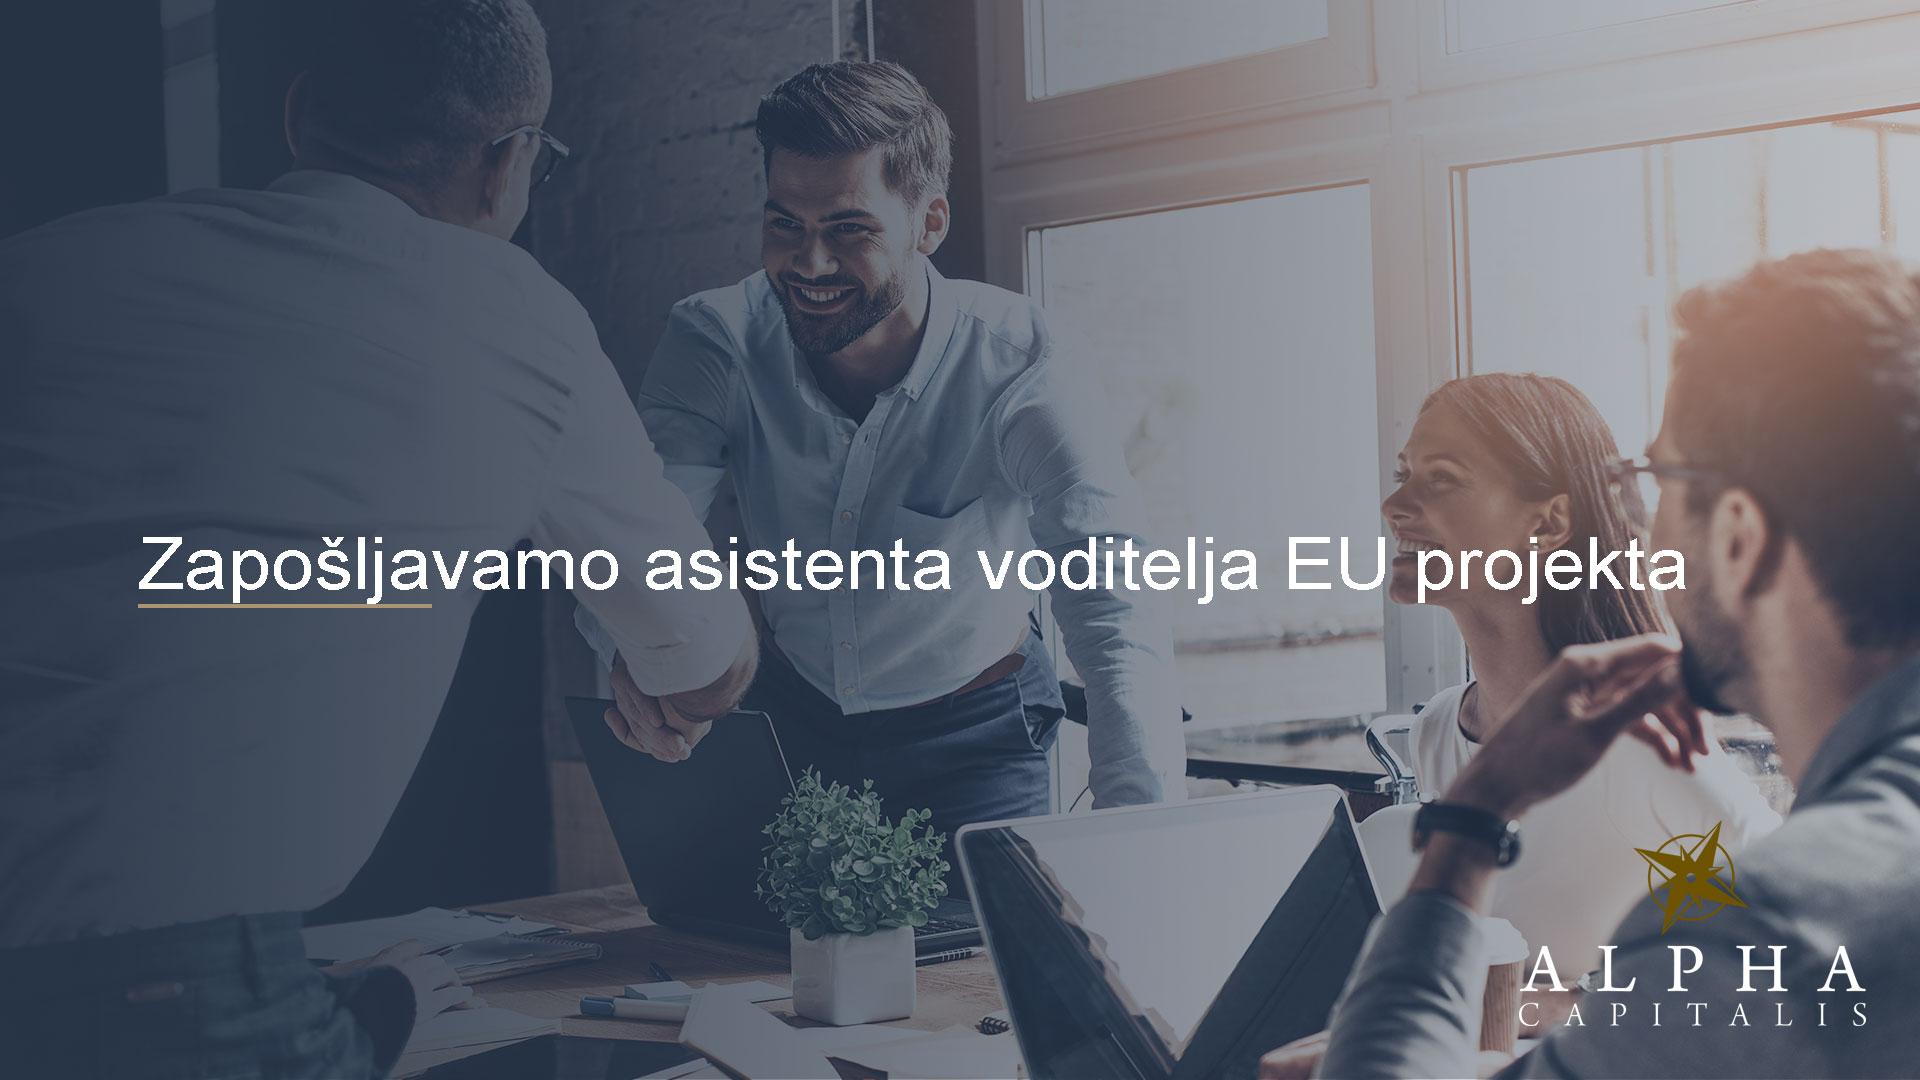 Alpha Capitalis-EU-Moj posao